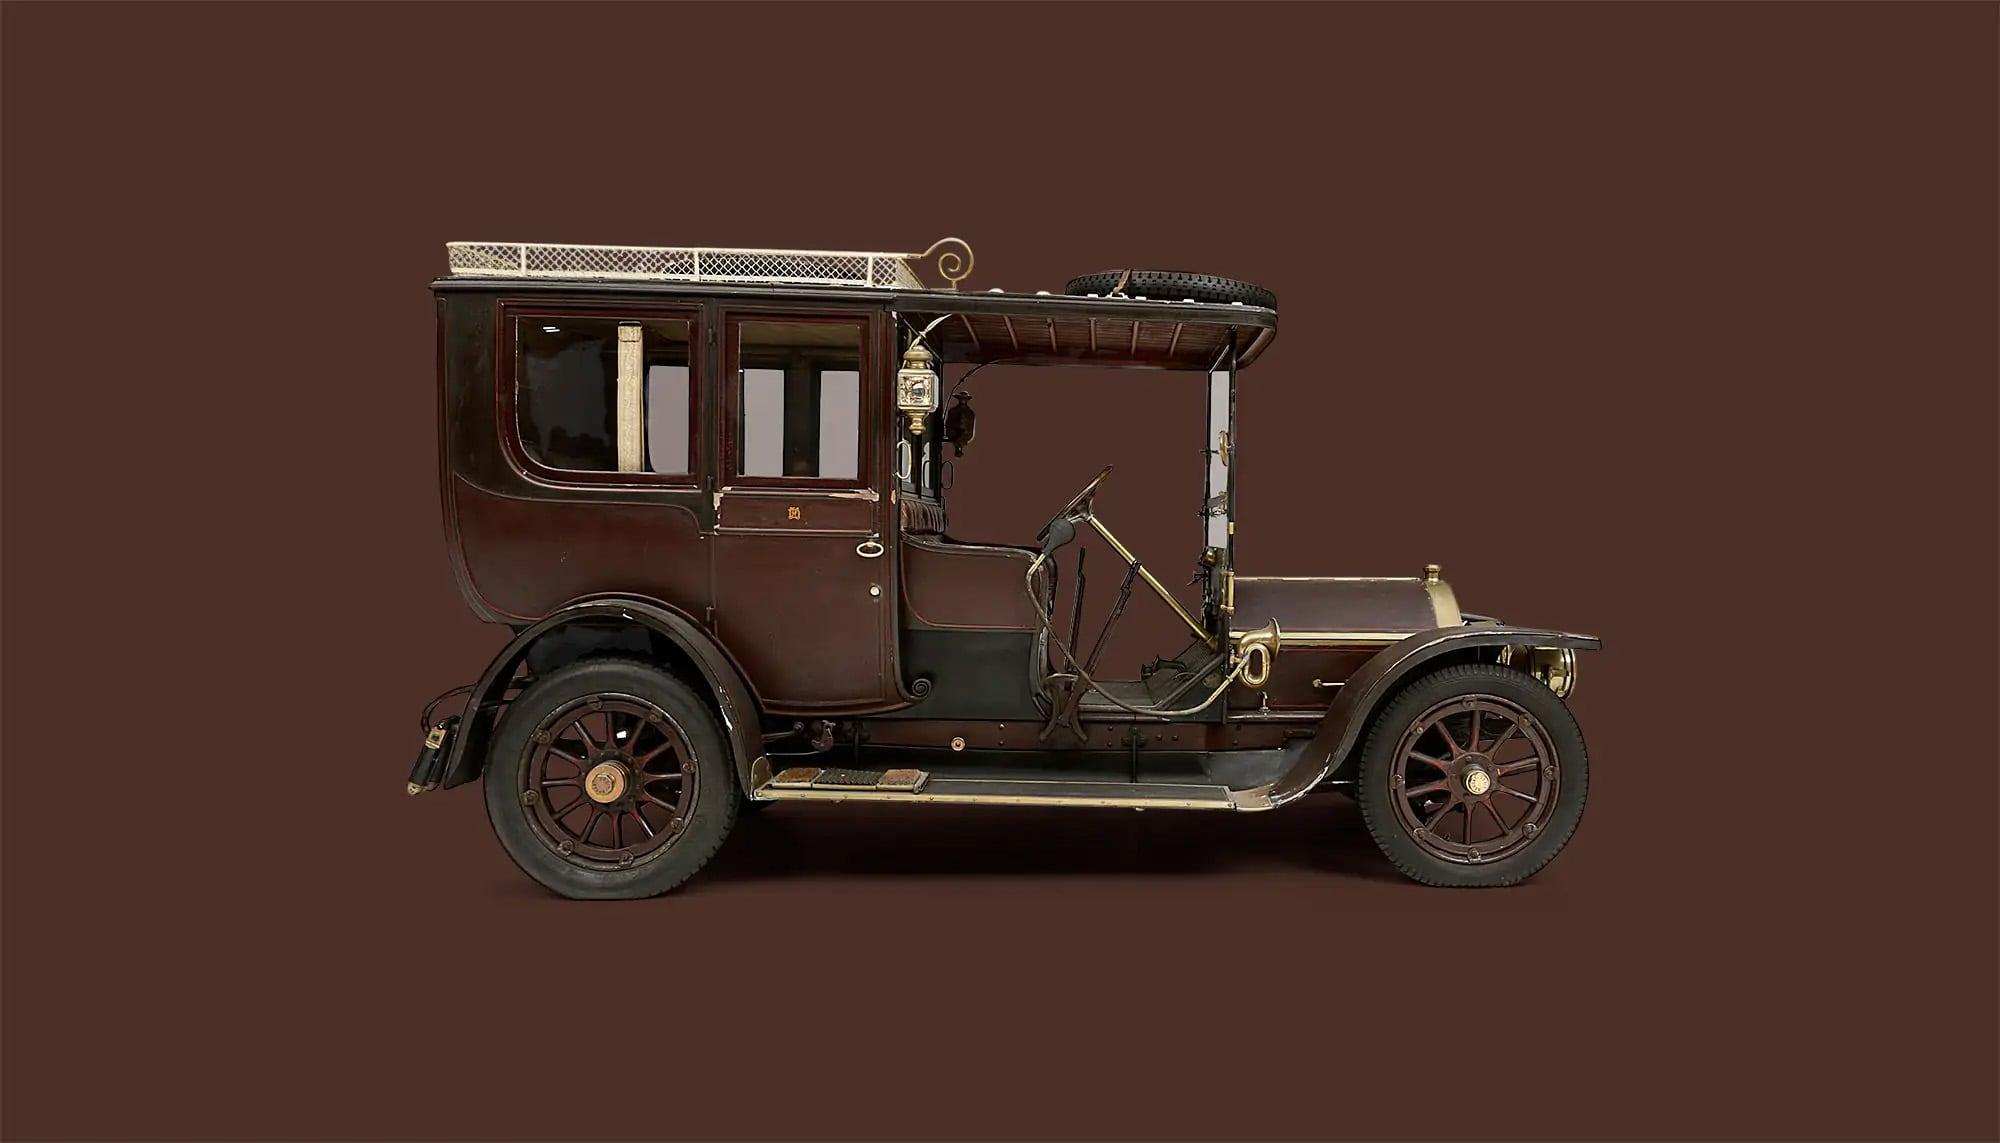 Bekijk Nagant Type D 14-16HP Town Car in het Louwman Museum